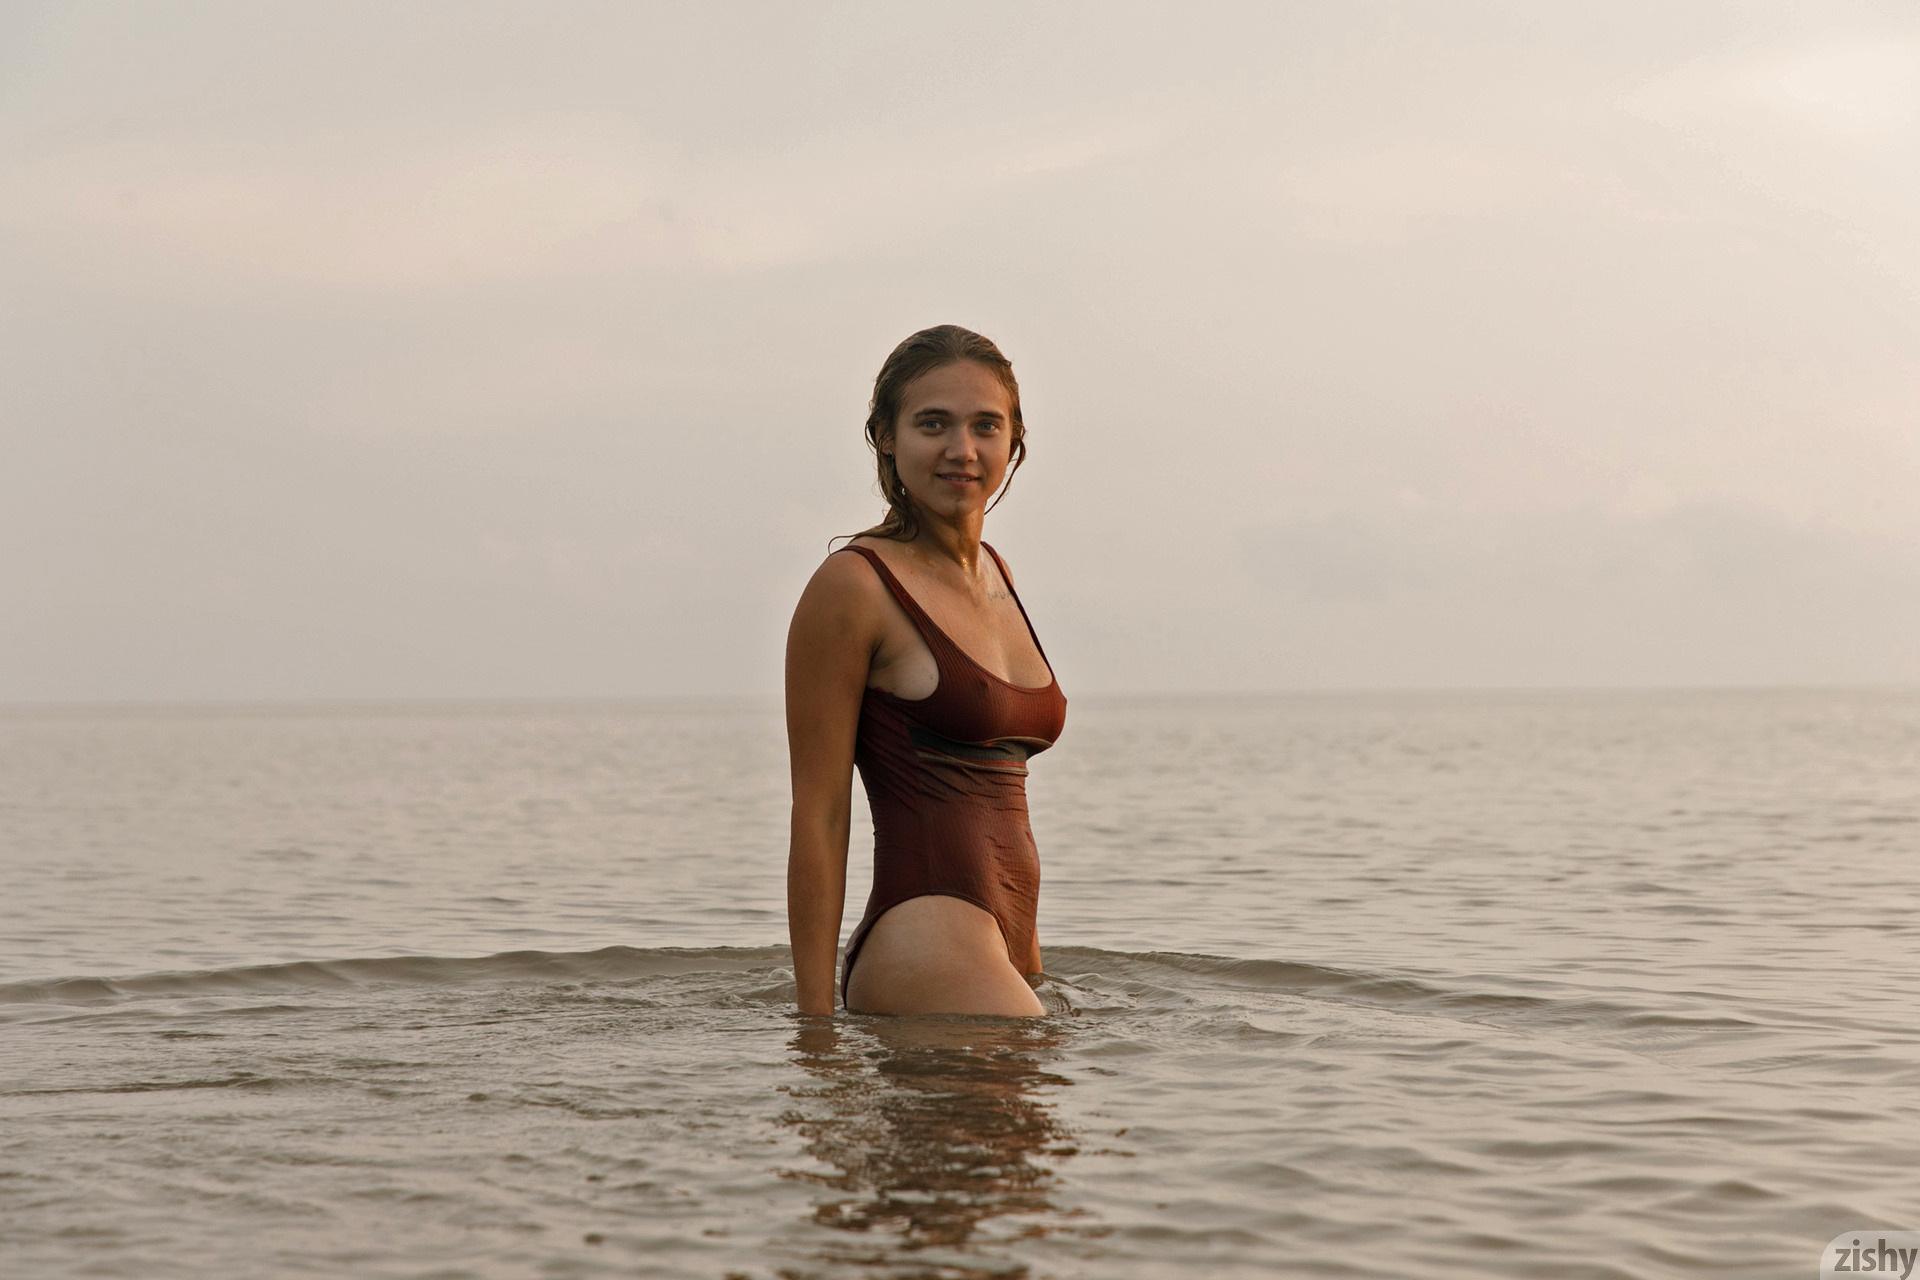 Sofia Orlova On Gryaznyy Beach Zishy (81)